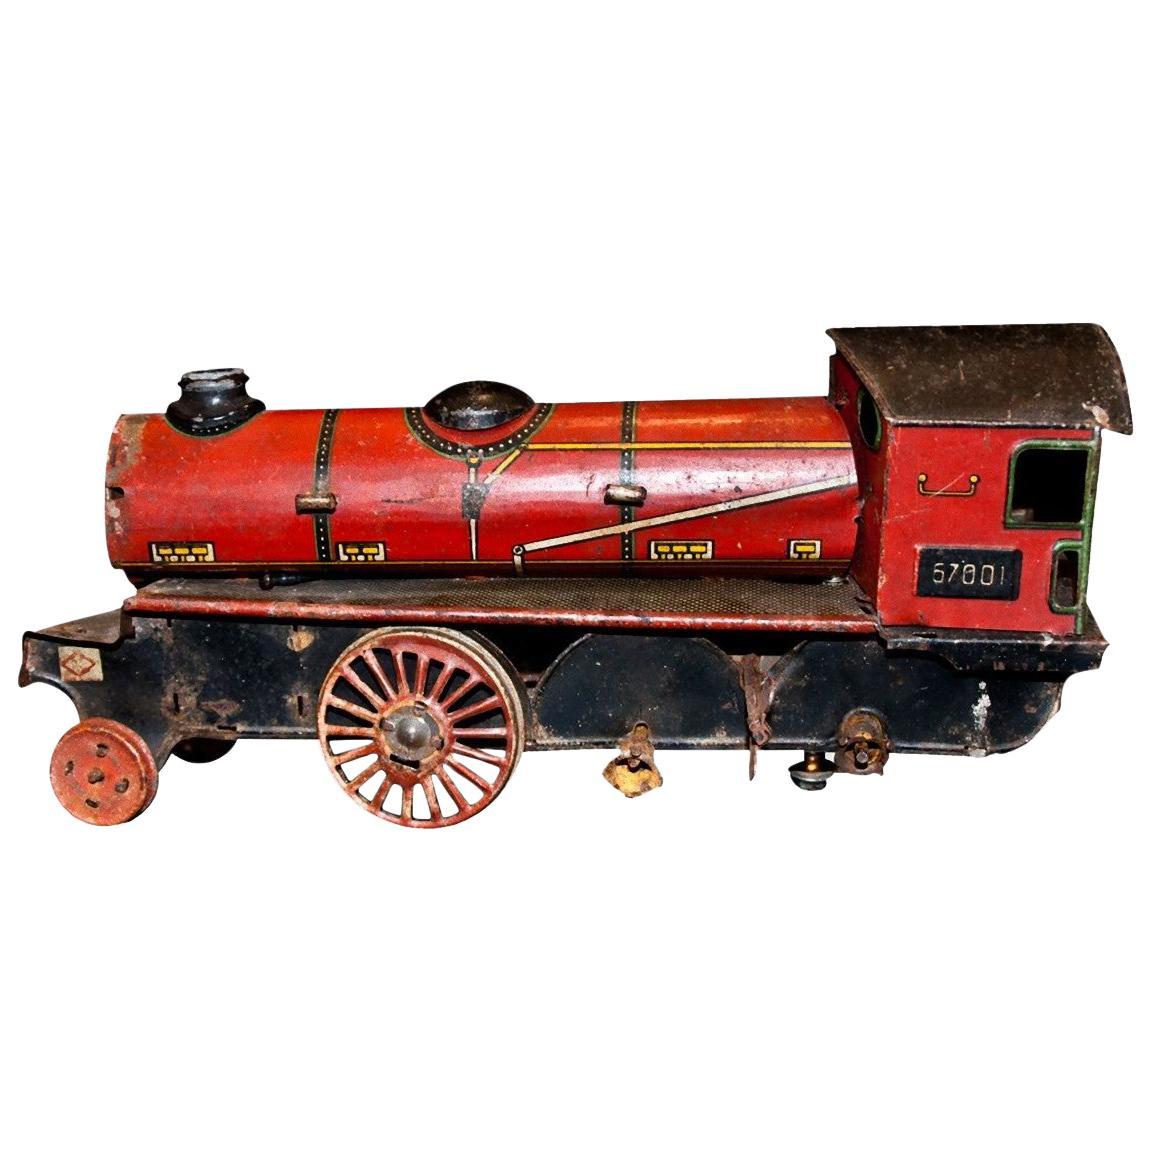 Vintage Toy, Wind up Locomotive Ingap 67001, Made by Ingap, 1920s